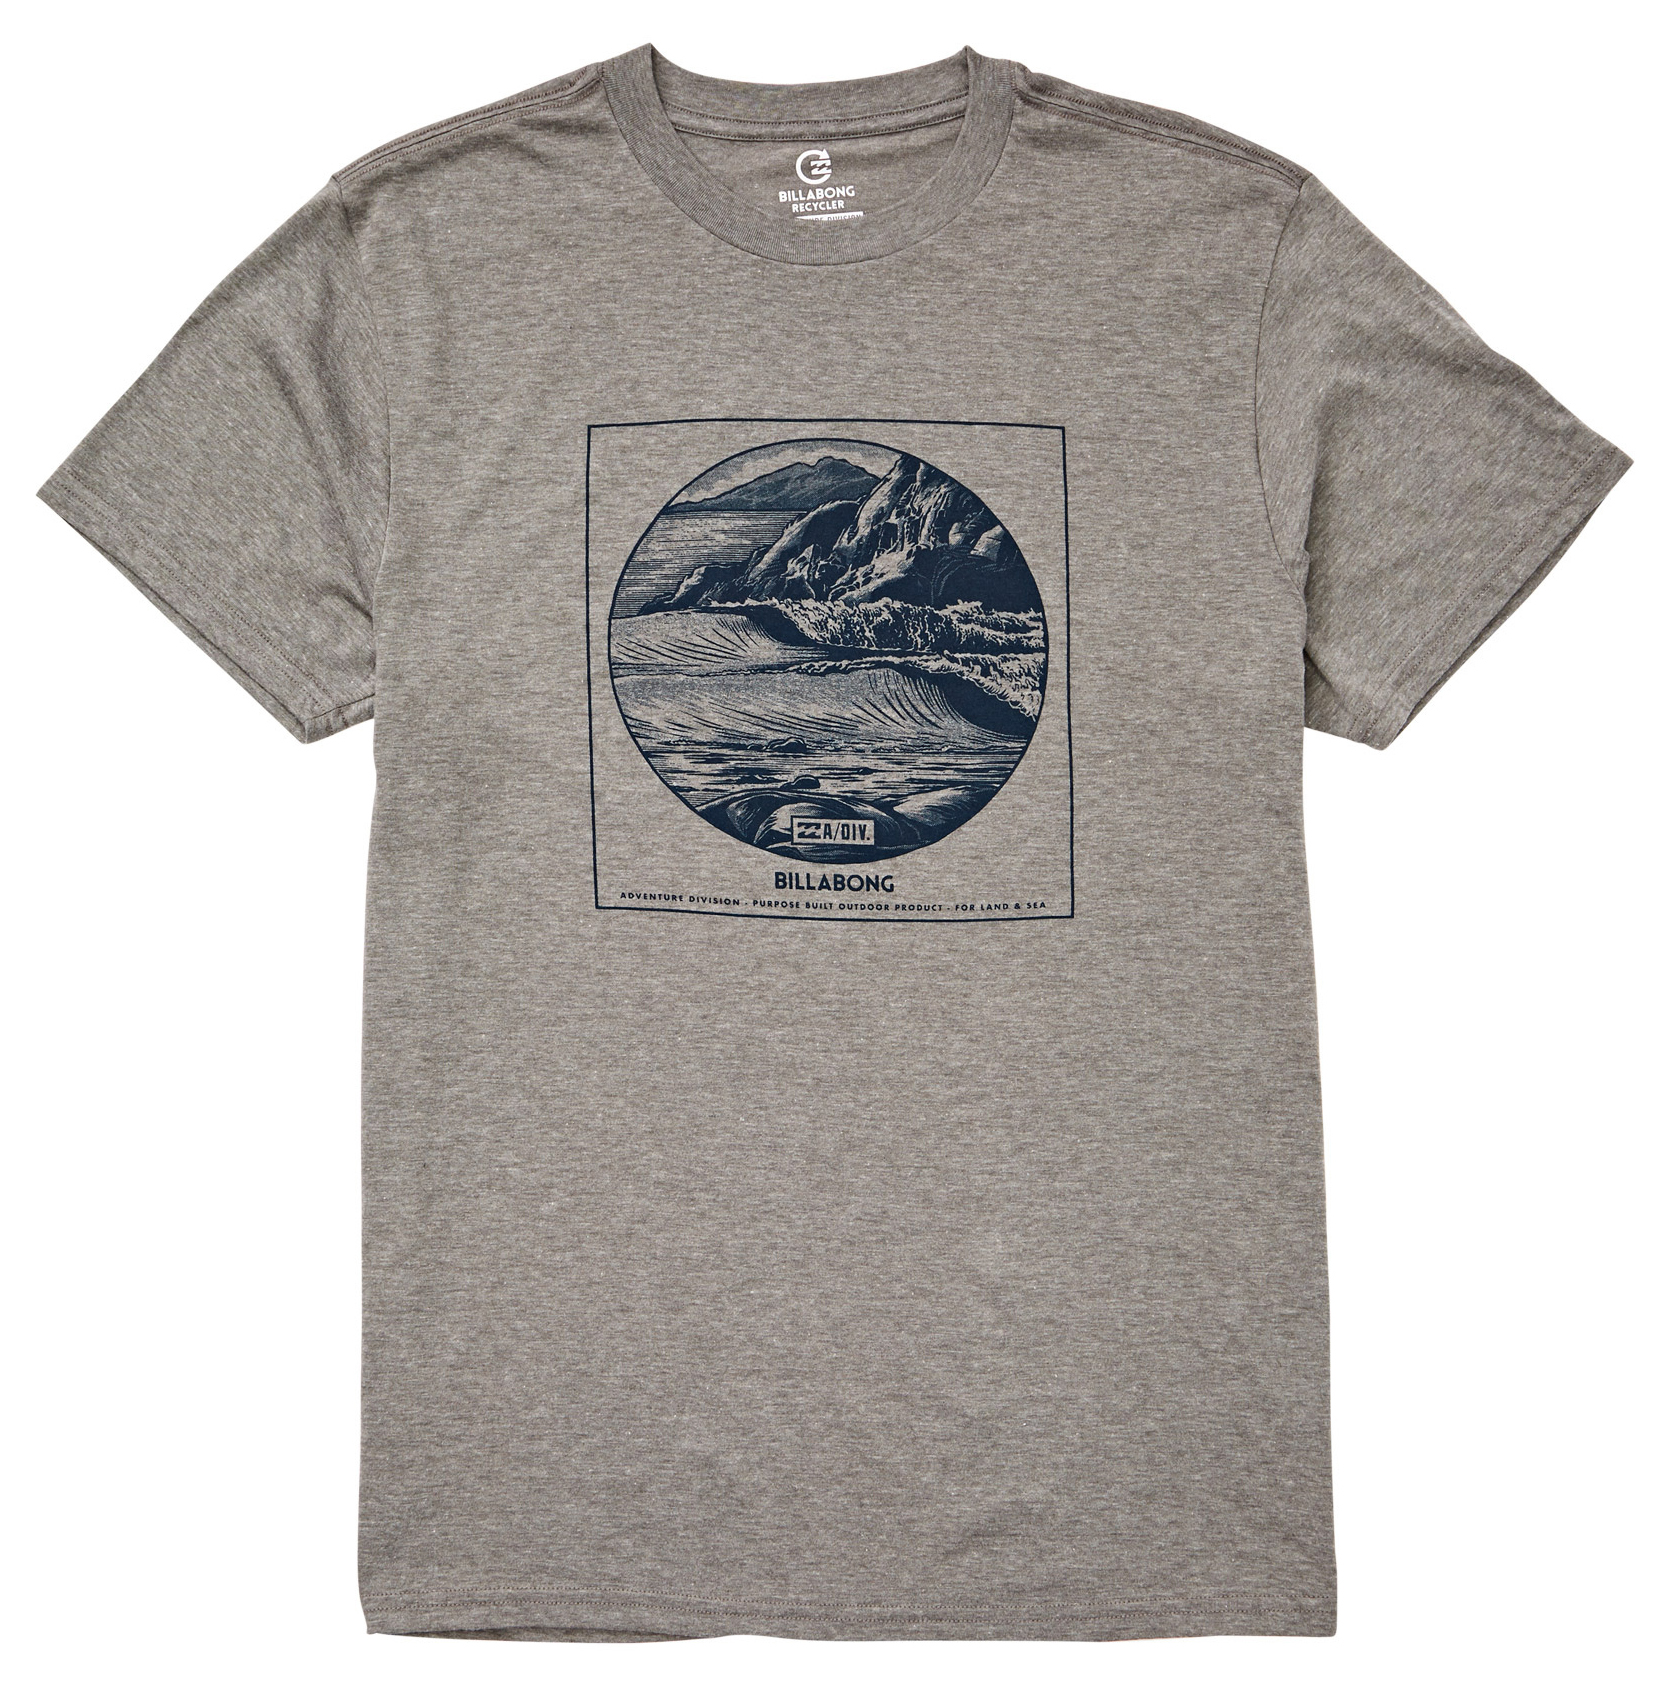 Billabong La Punta Short Sleeve T-Shirt -